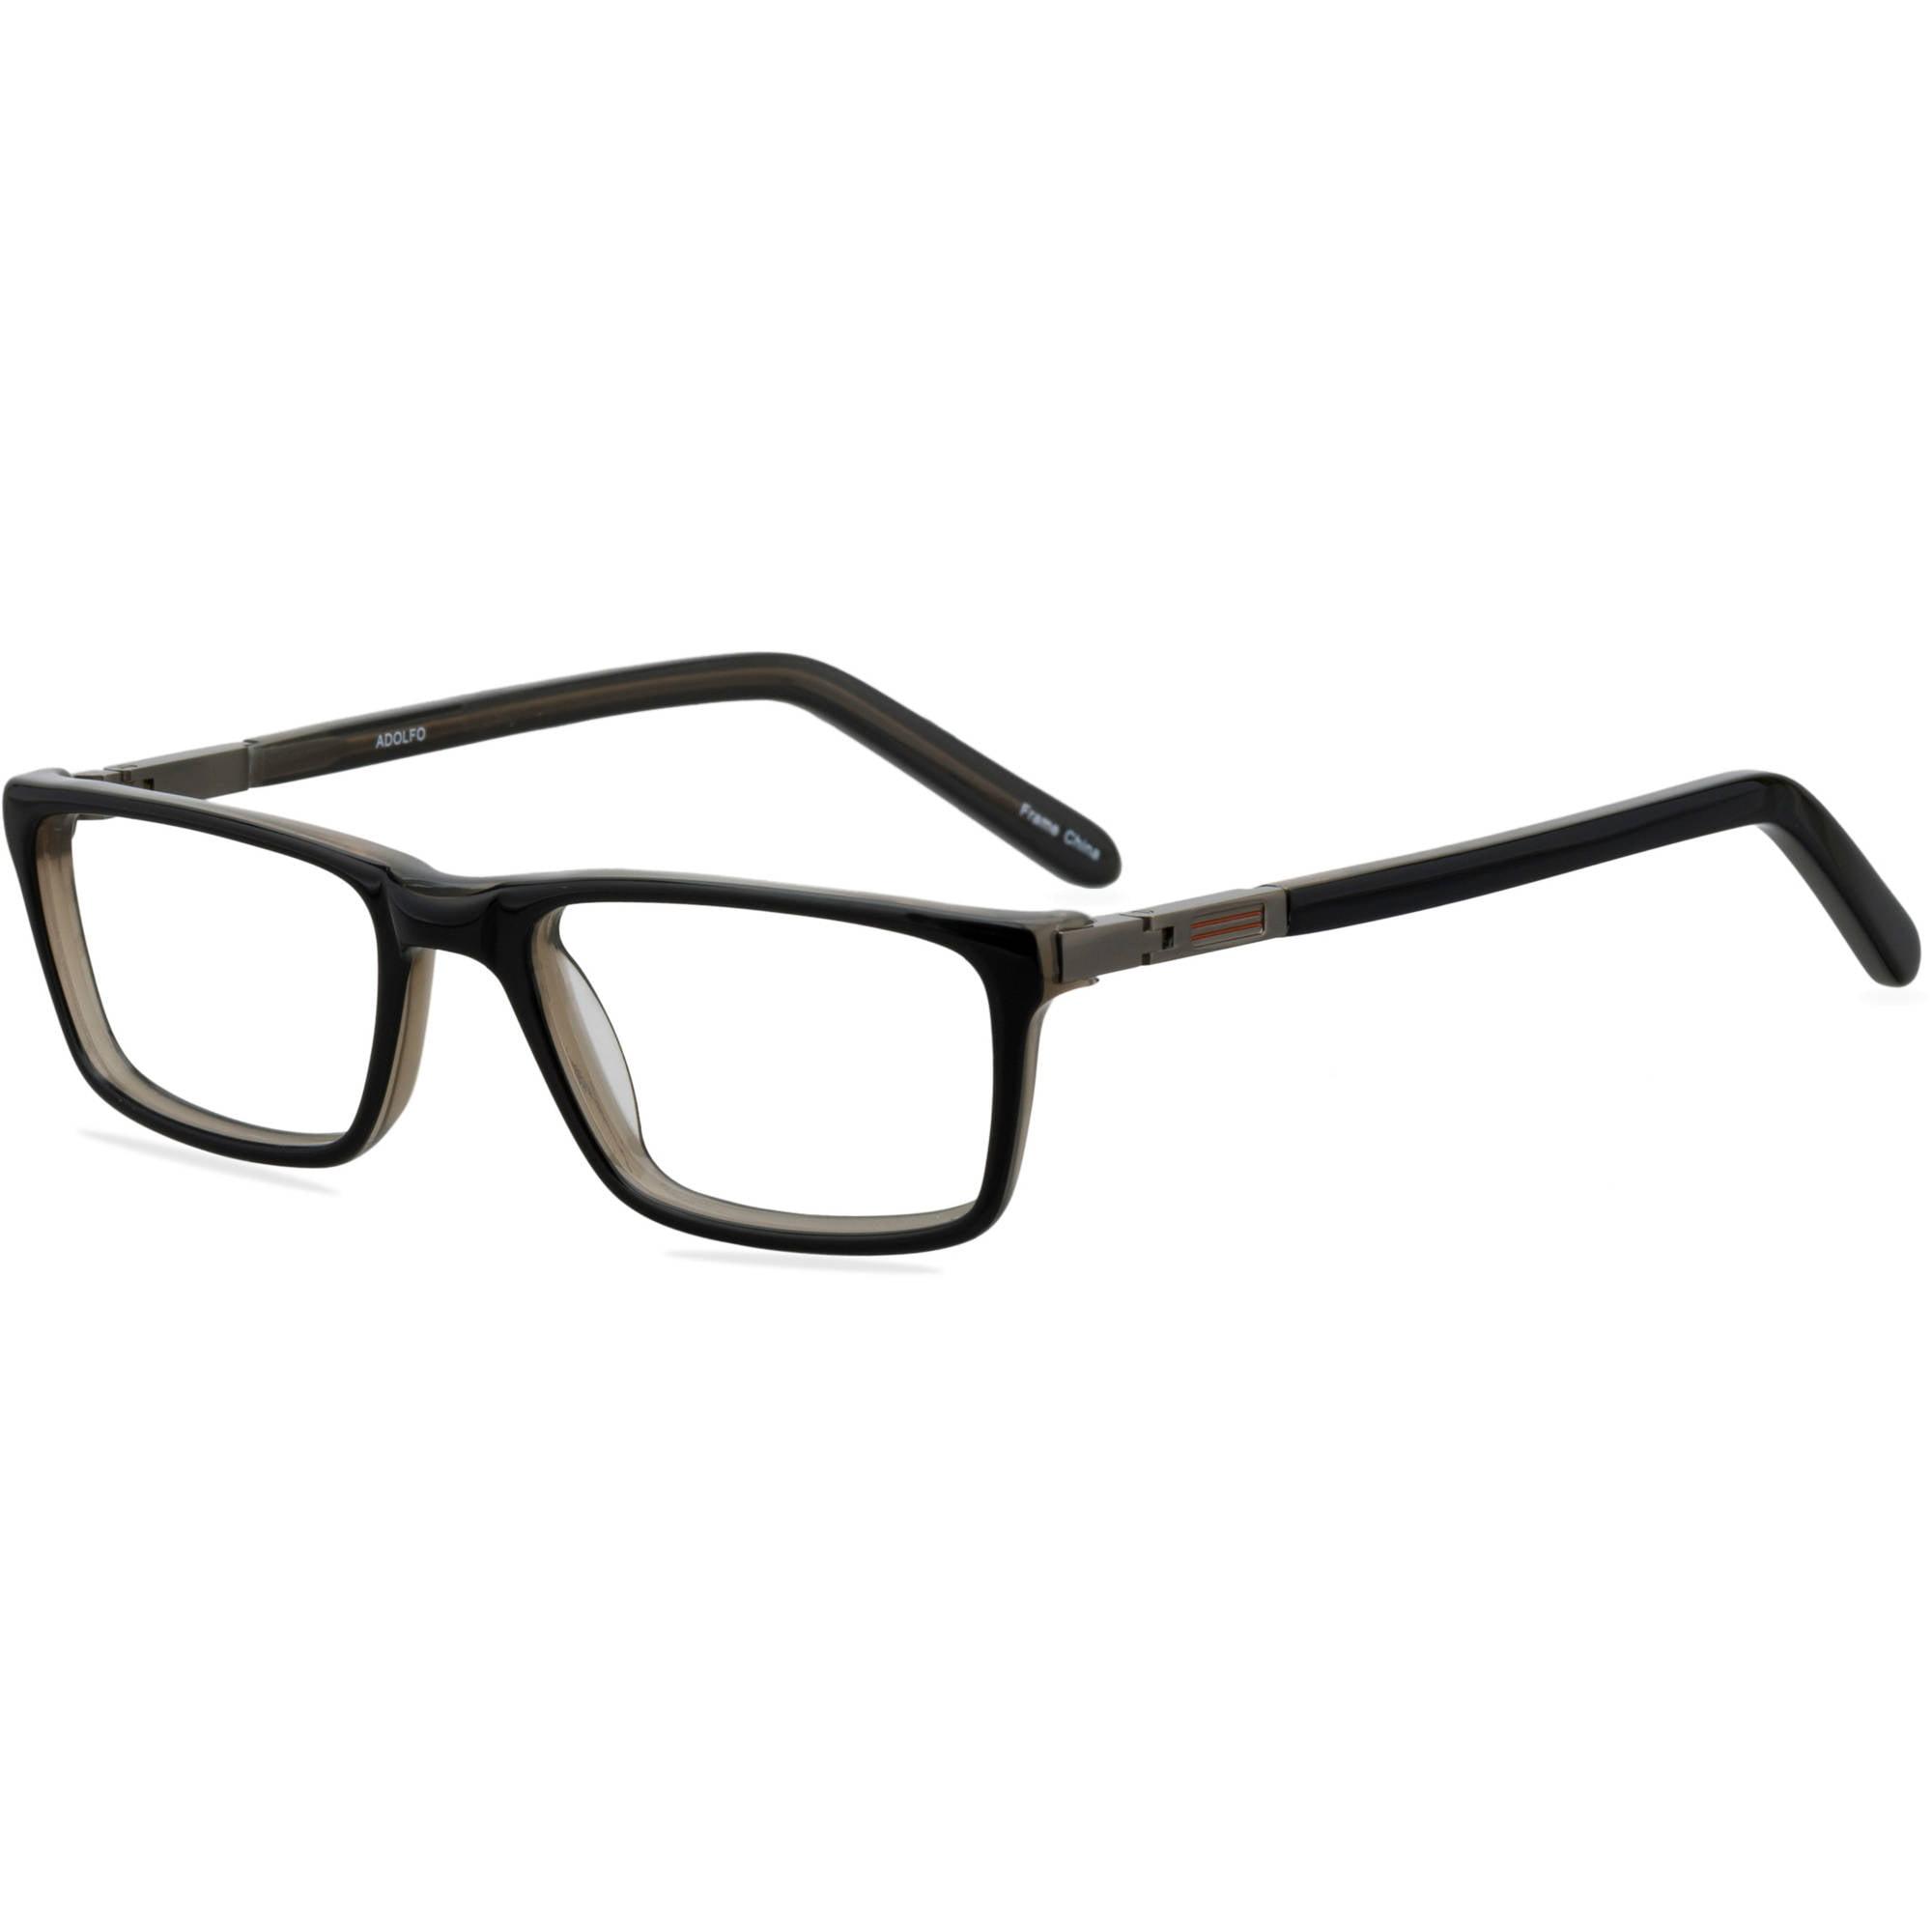 4bfaab084e8 ADOLFO Boys Prescription Glasses